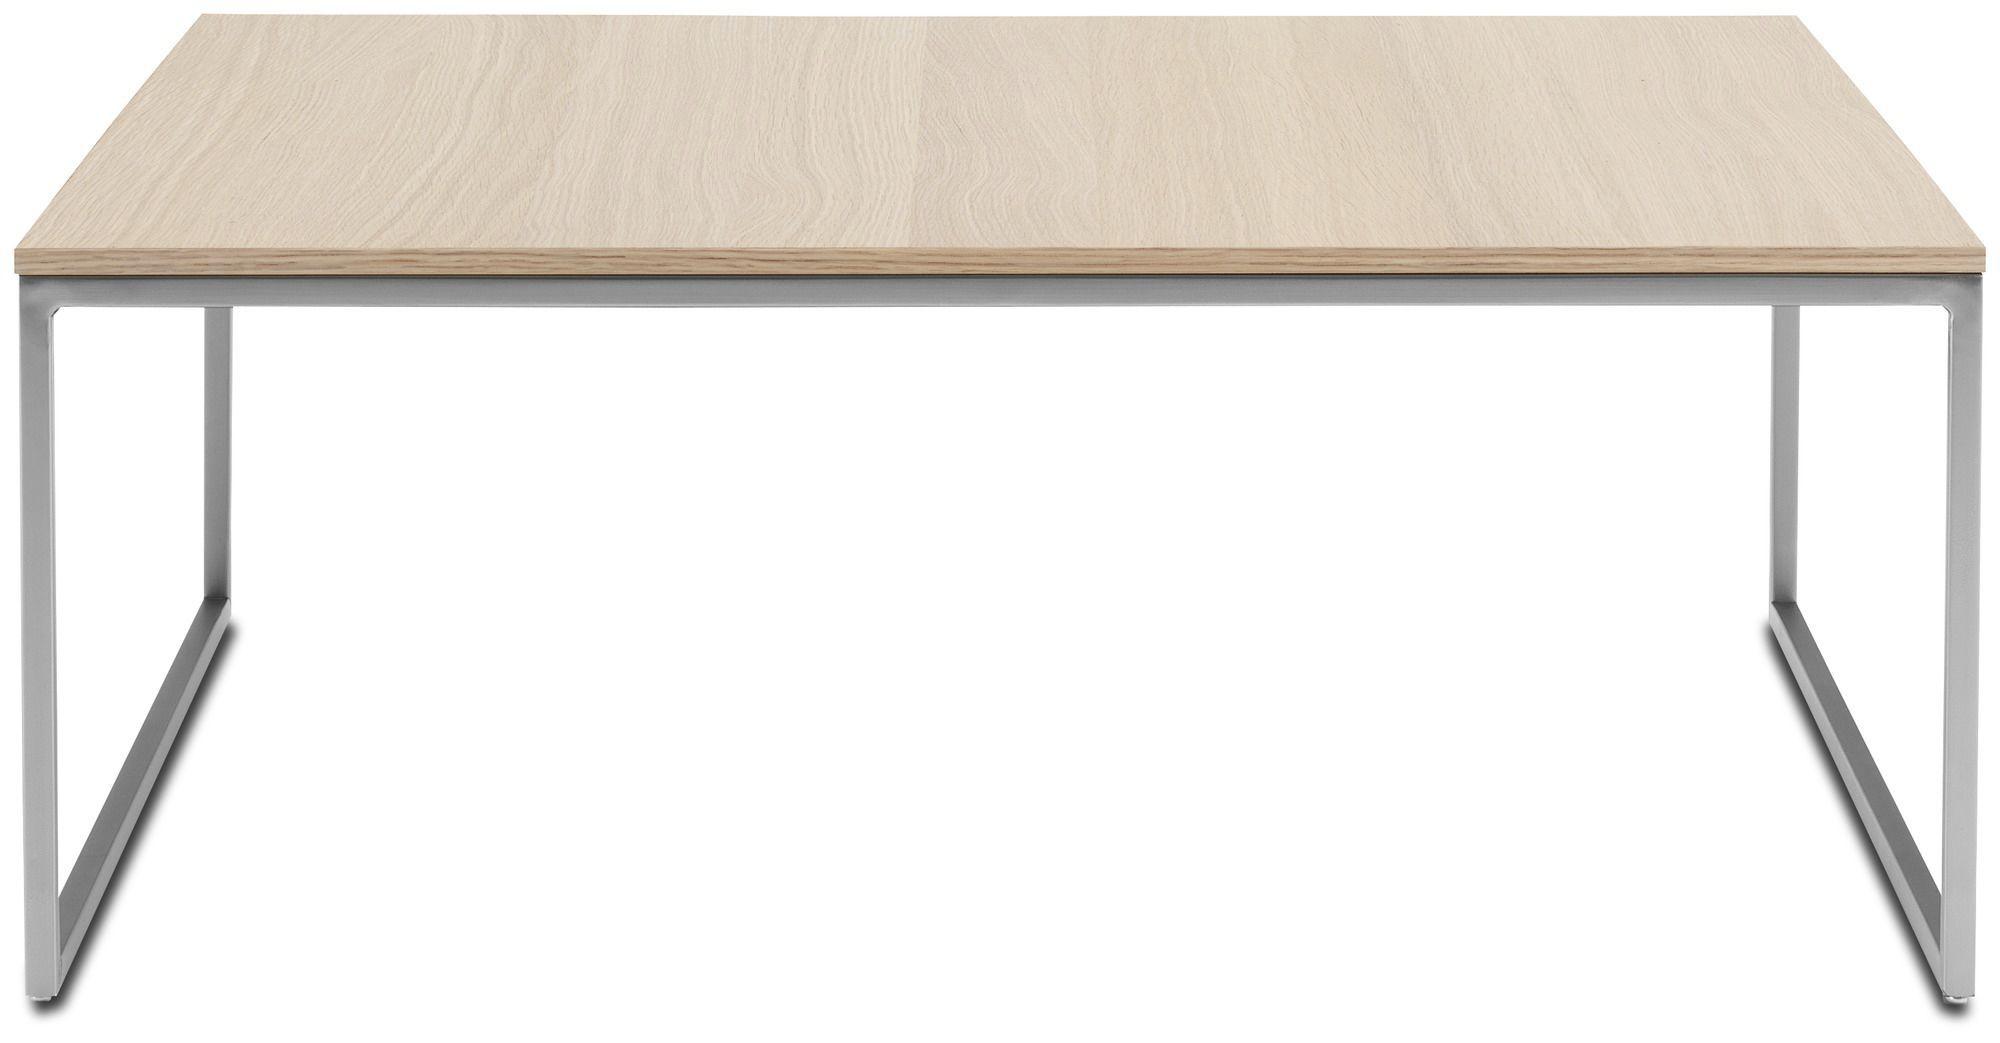 contemporary coffee table / mdf / steel / rectangular - lugo